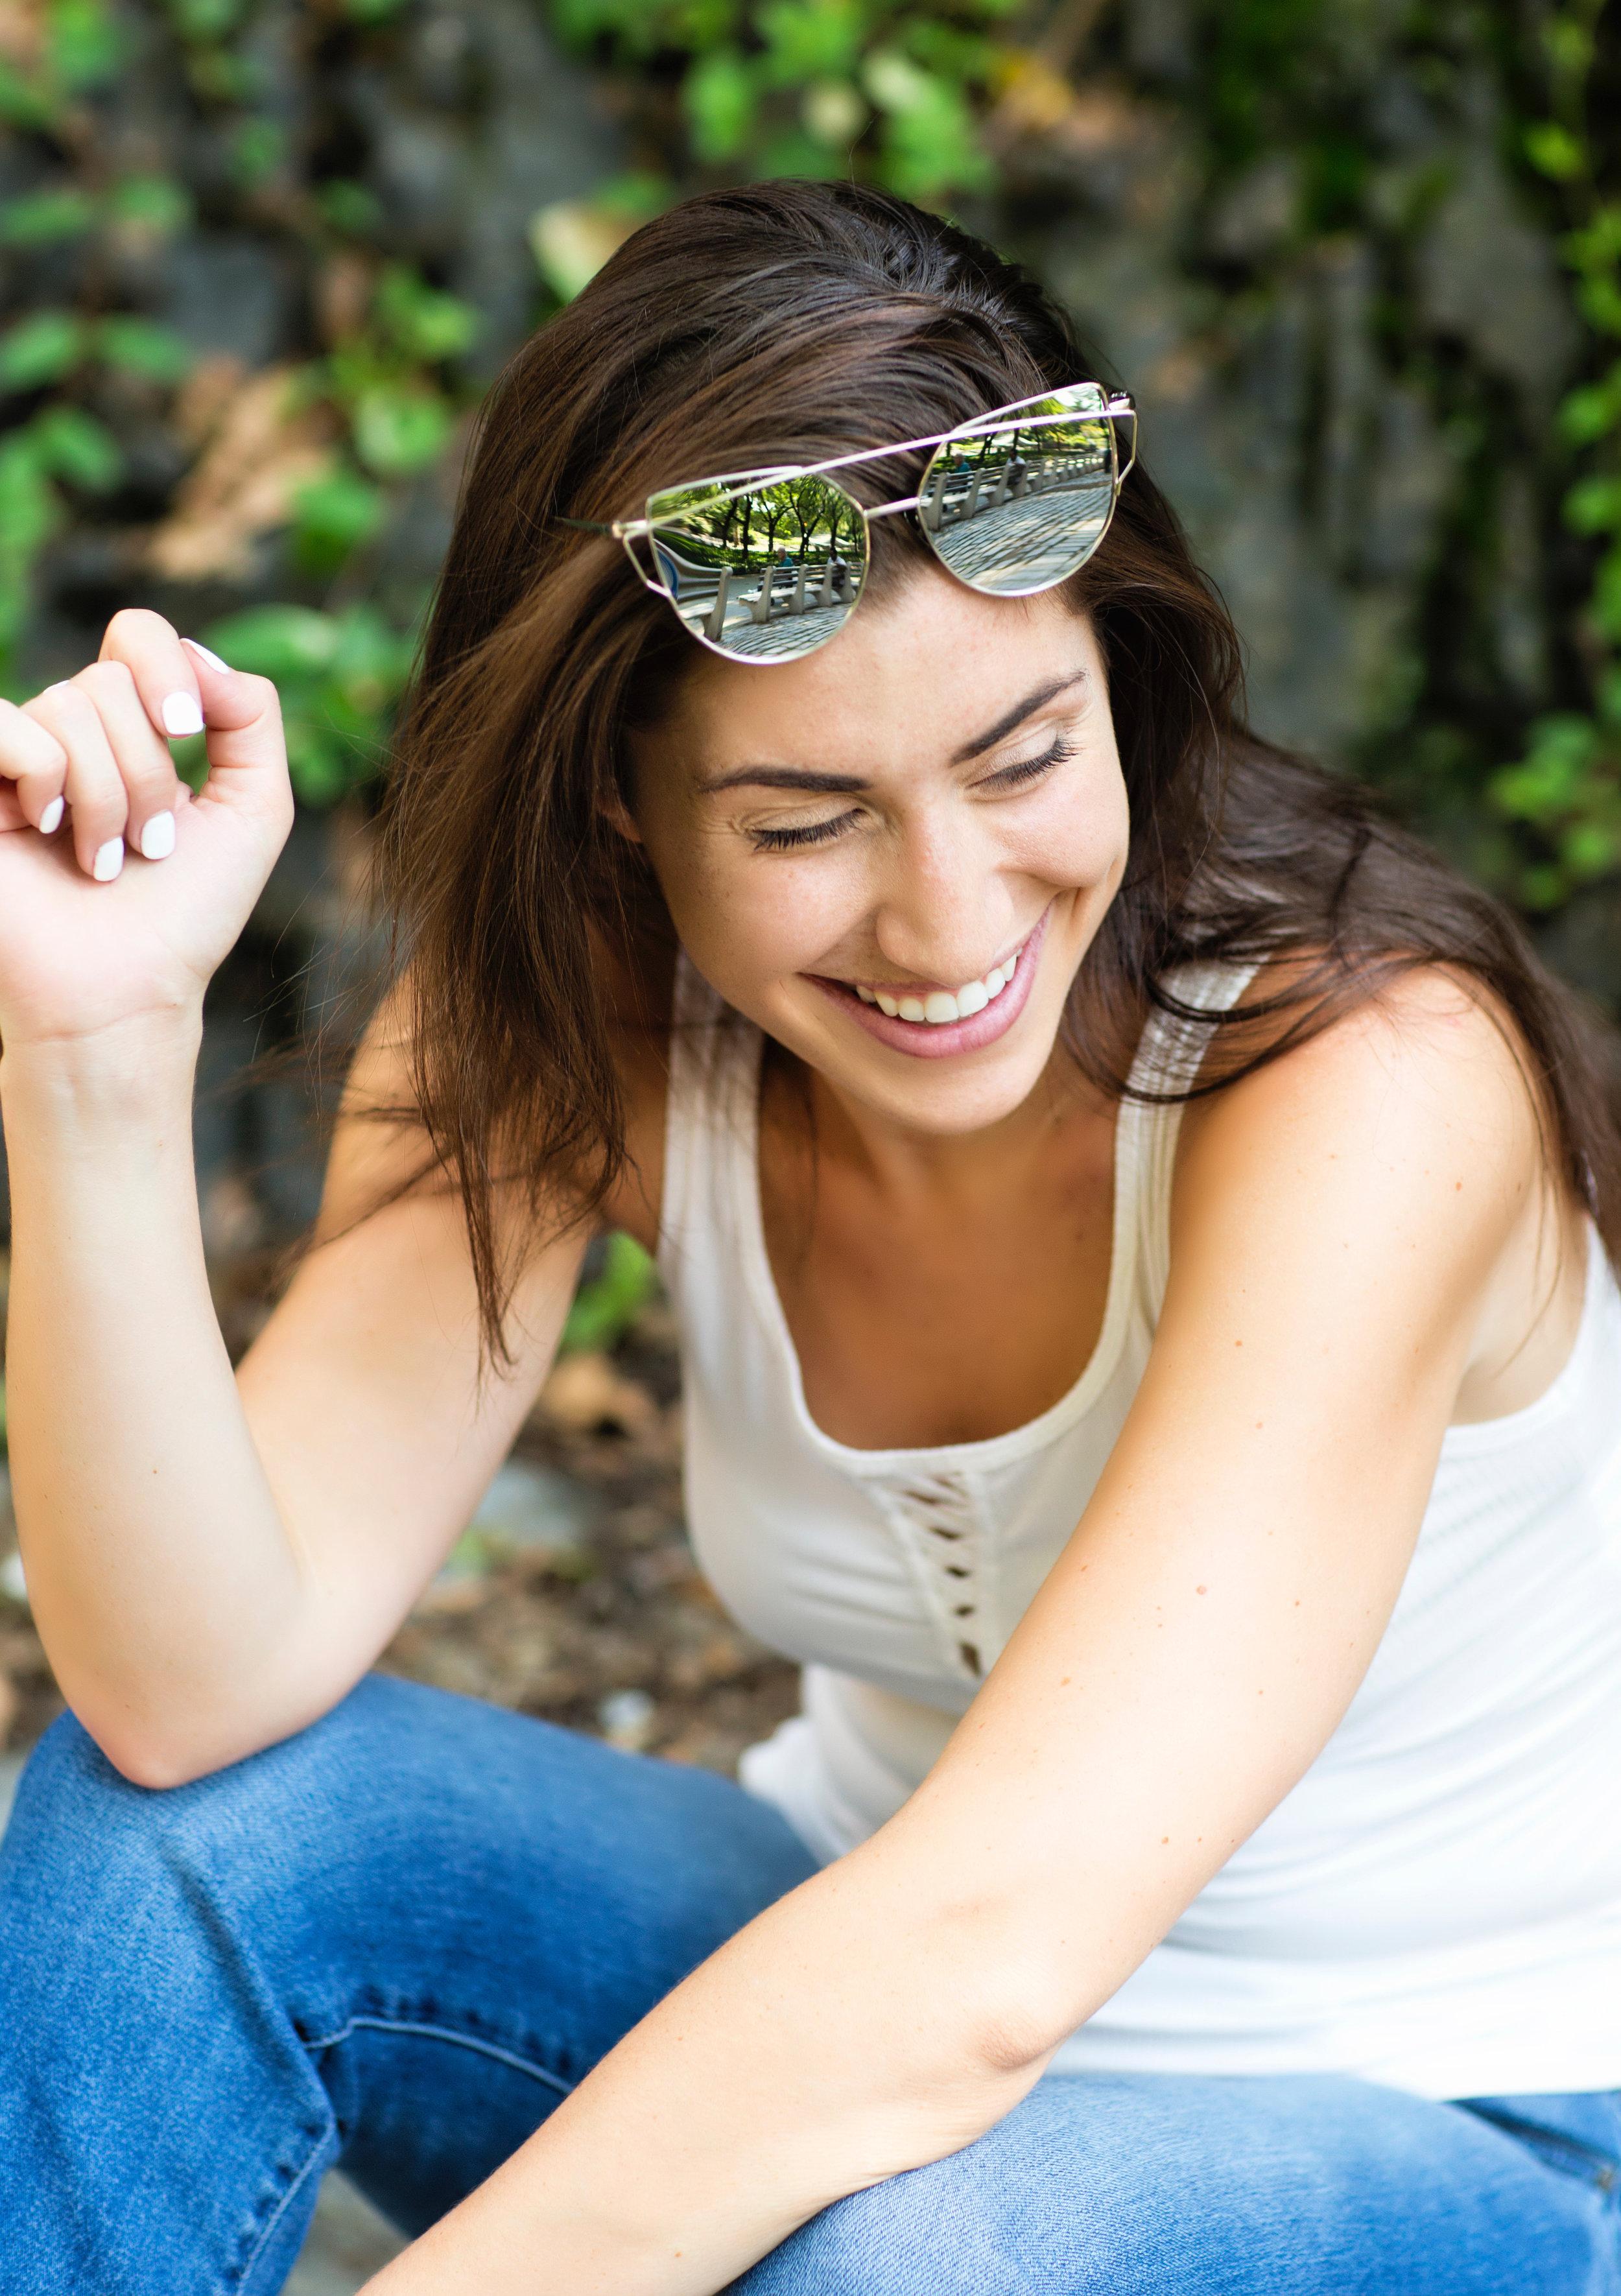 Rebecca Brookstein Photography    Livhò  Sunglasses for Women,